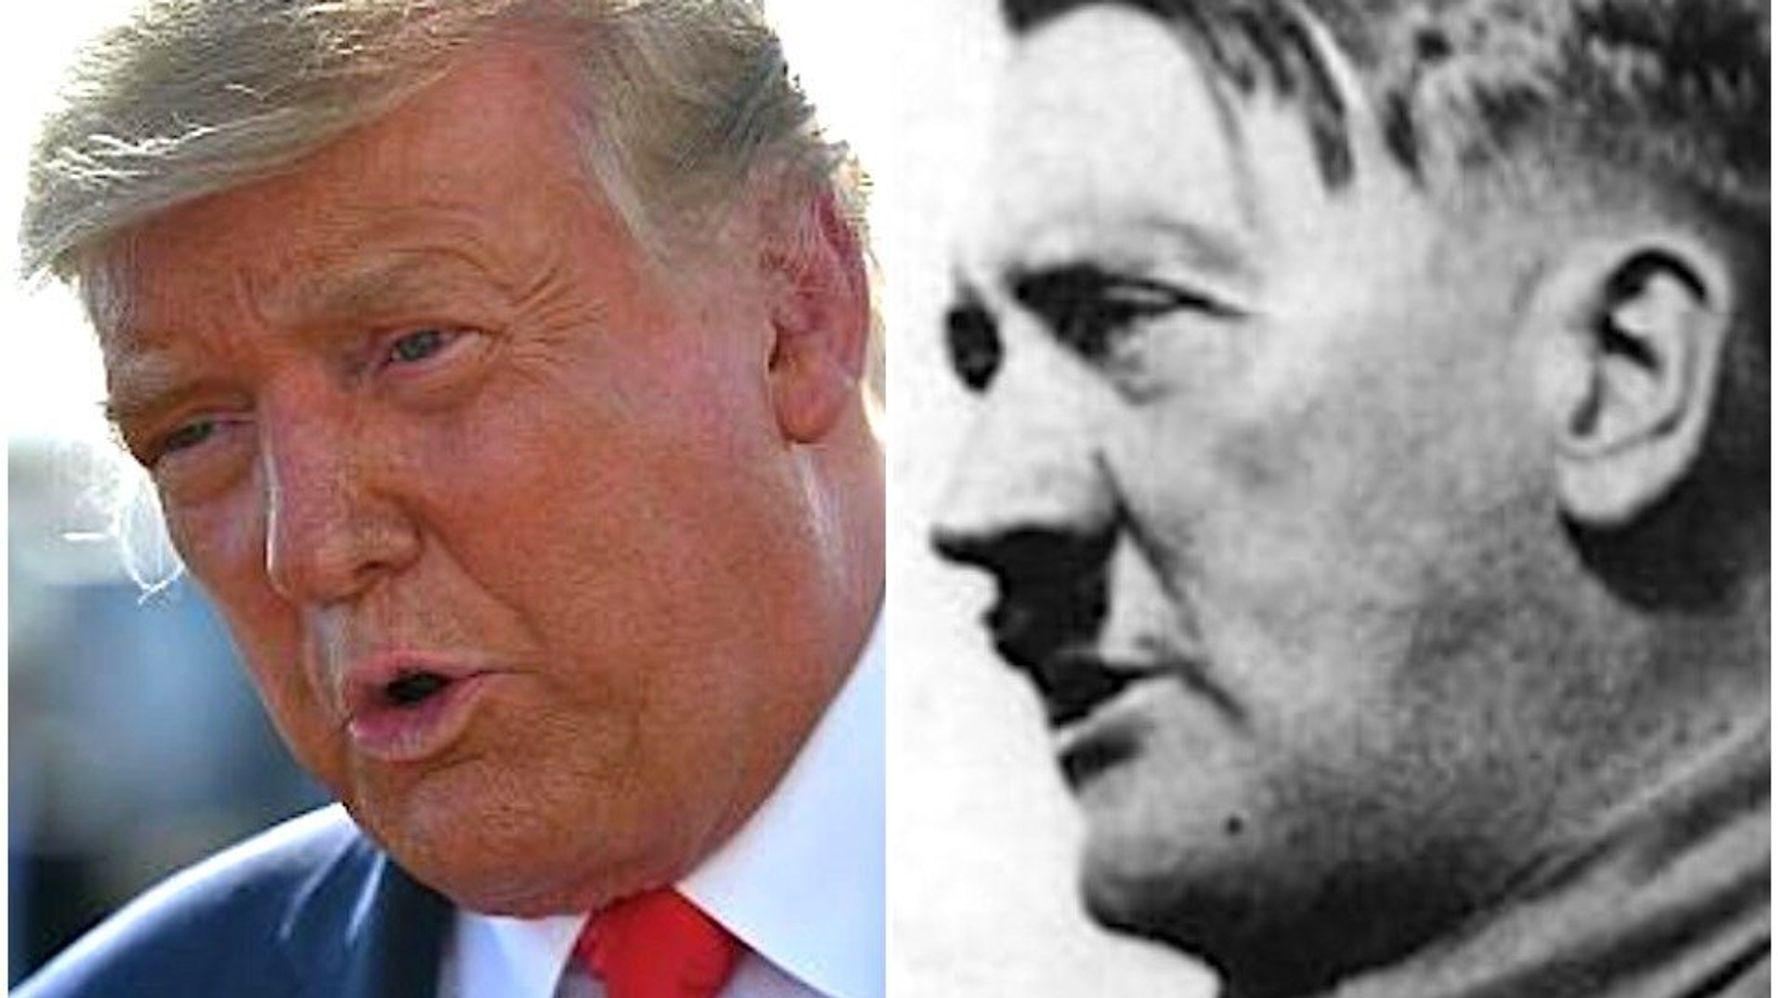 Jimmy Kimmel's Adolf Hitler Joke Zings Donald Trump But Good